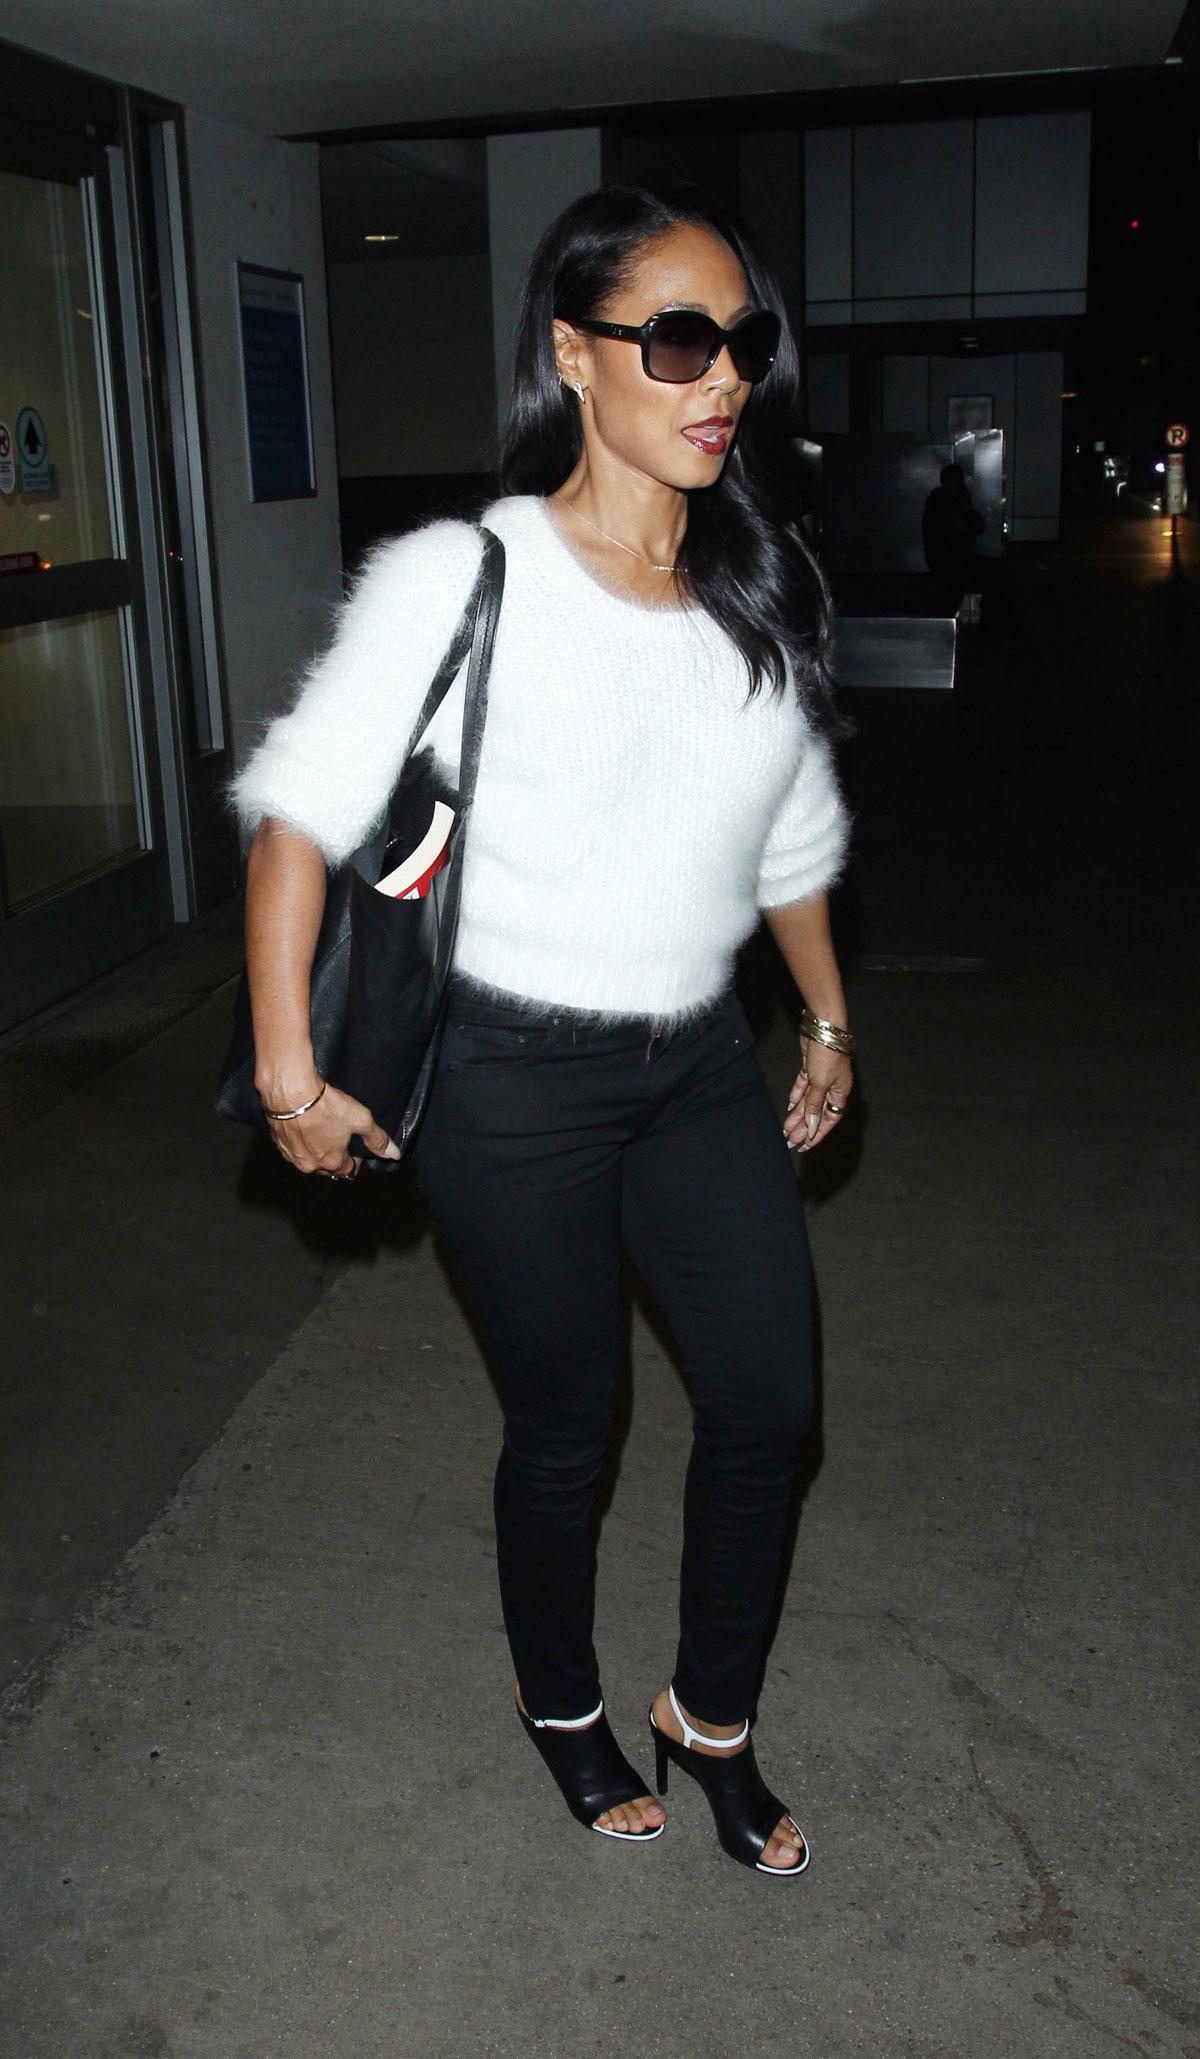 JADA PINKETT SMITH Arrives at LAX Airport in Los Amgeles